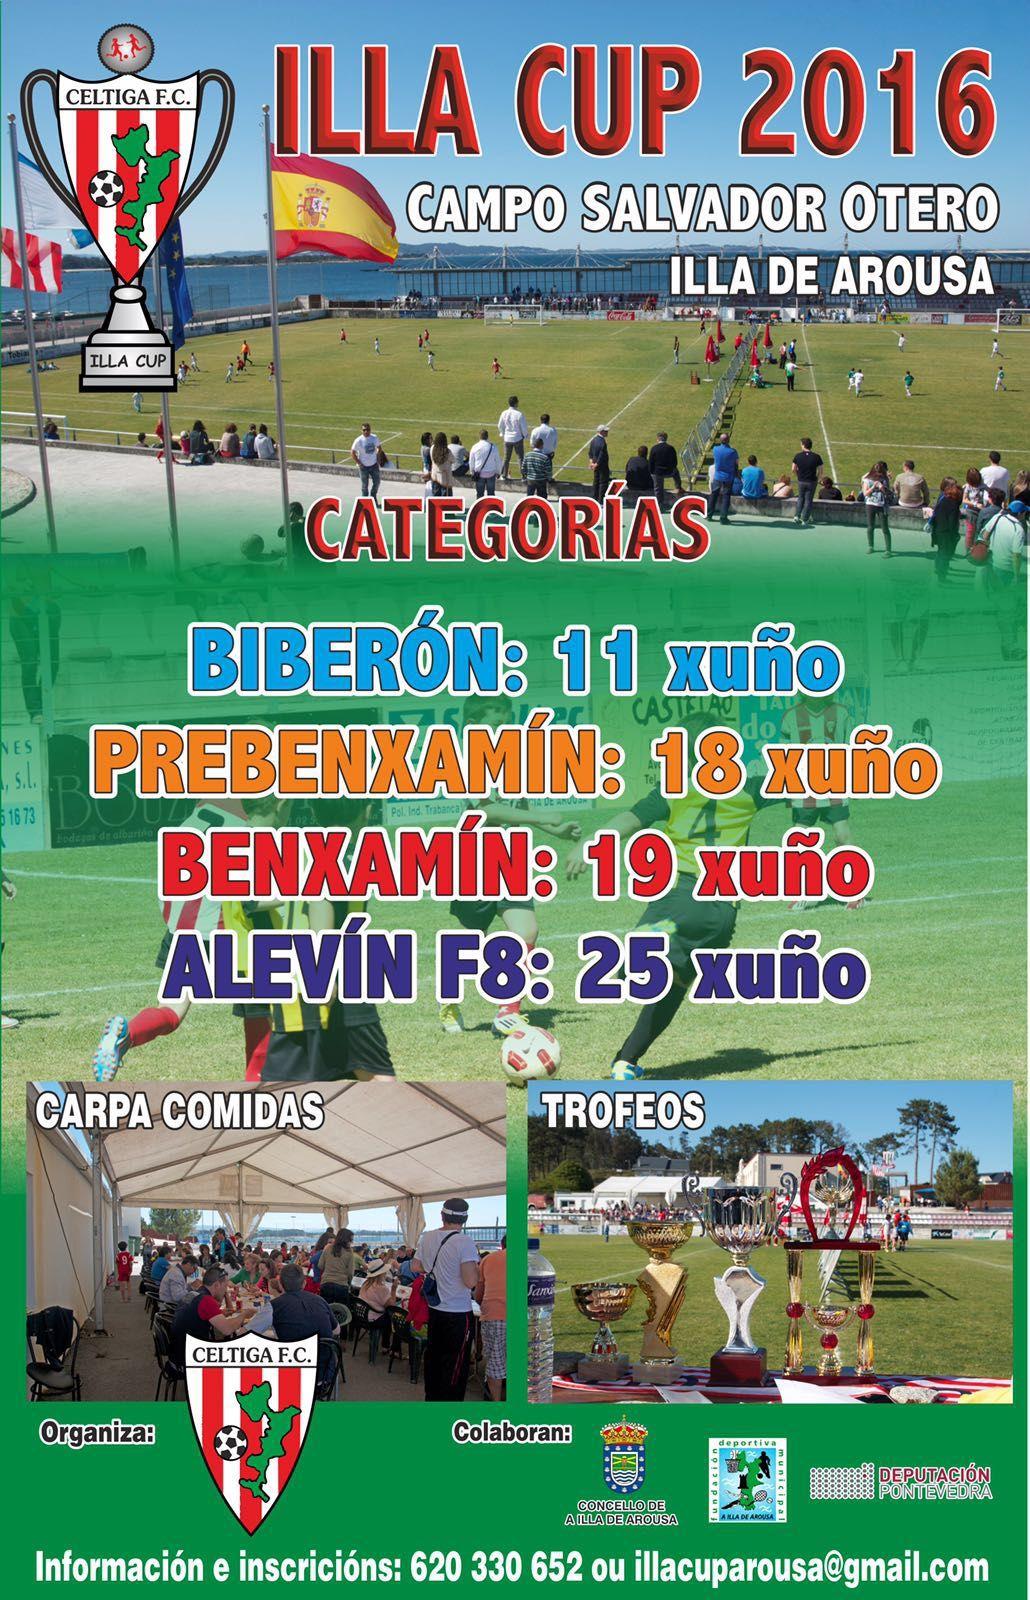 ILLA CUP 2016